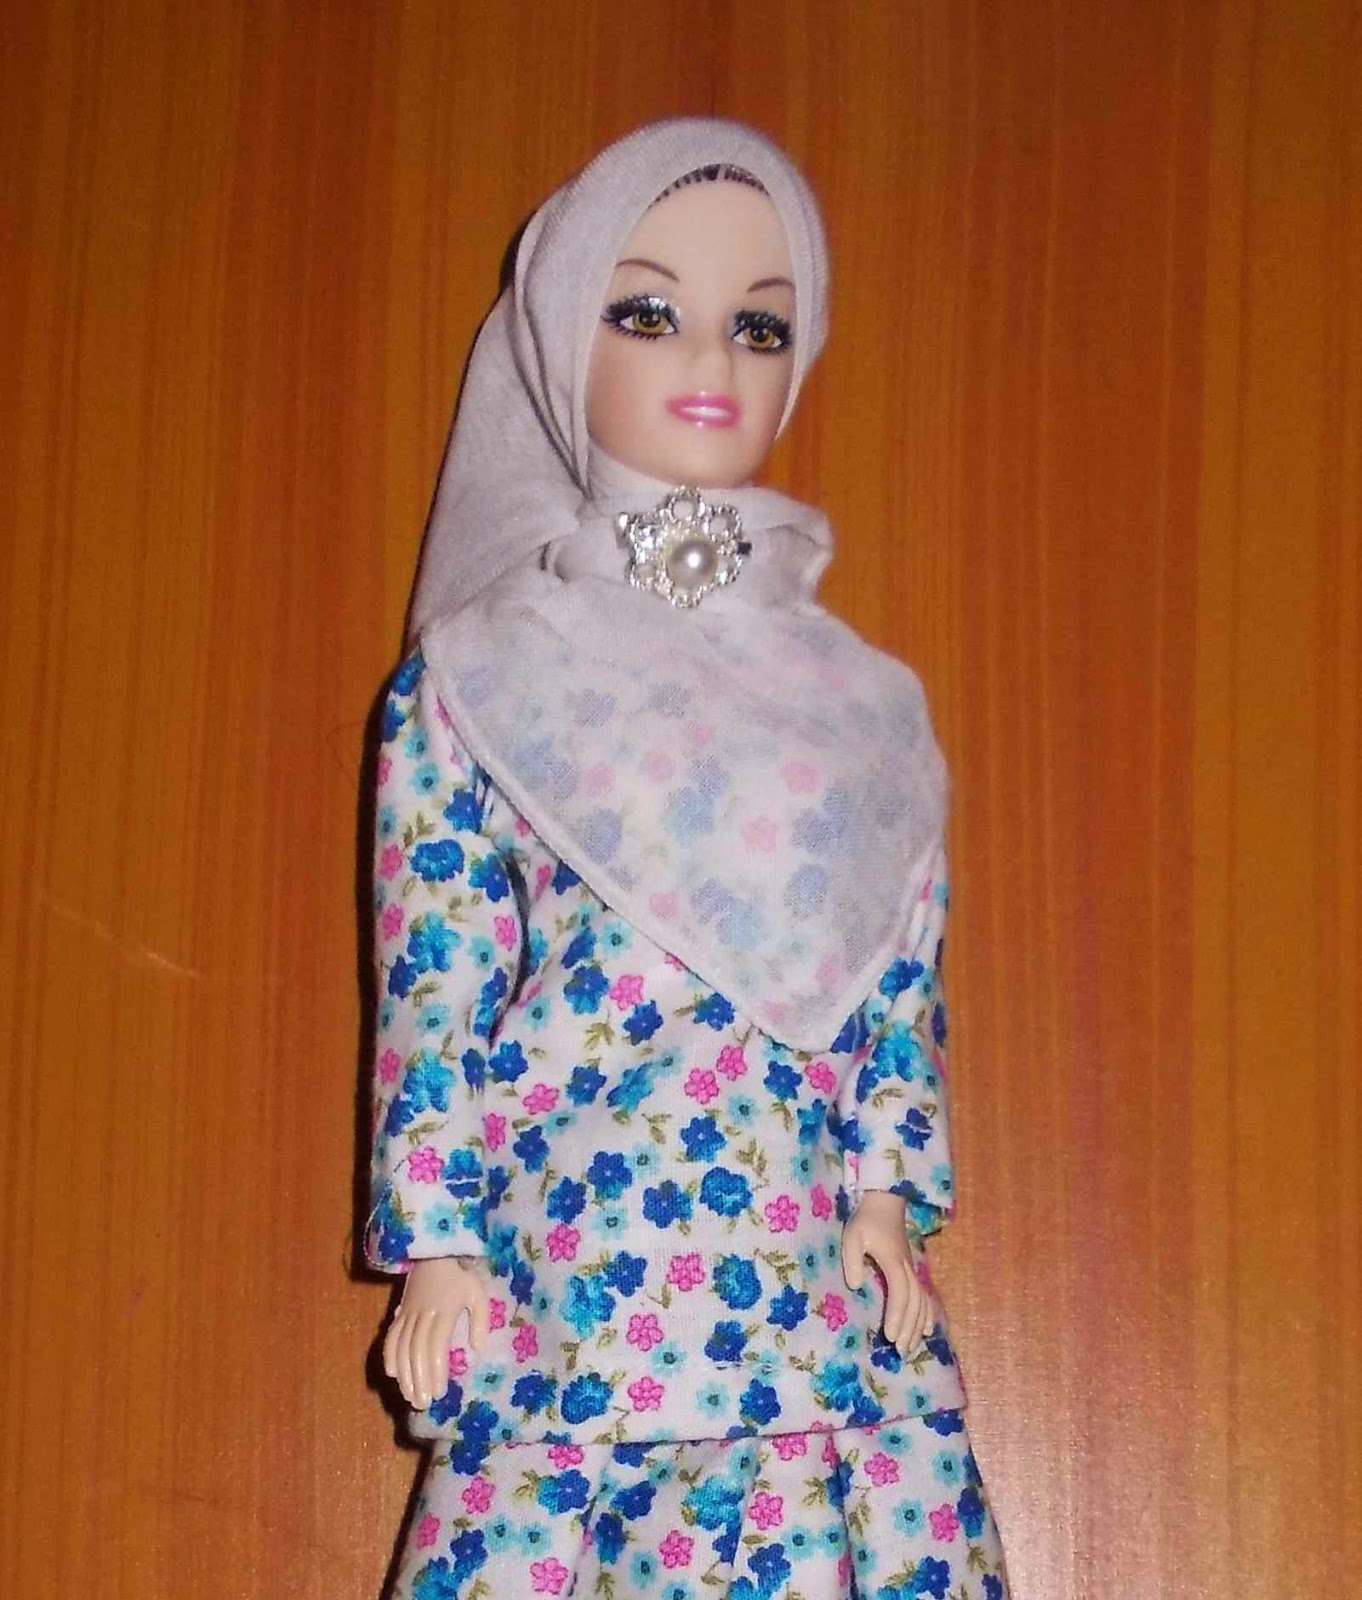 Kumpulan Gambar Boneka Barbie Muslim Cantik Dan Keren Untuk Anak 2015